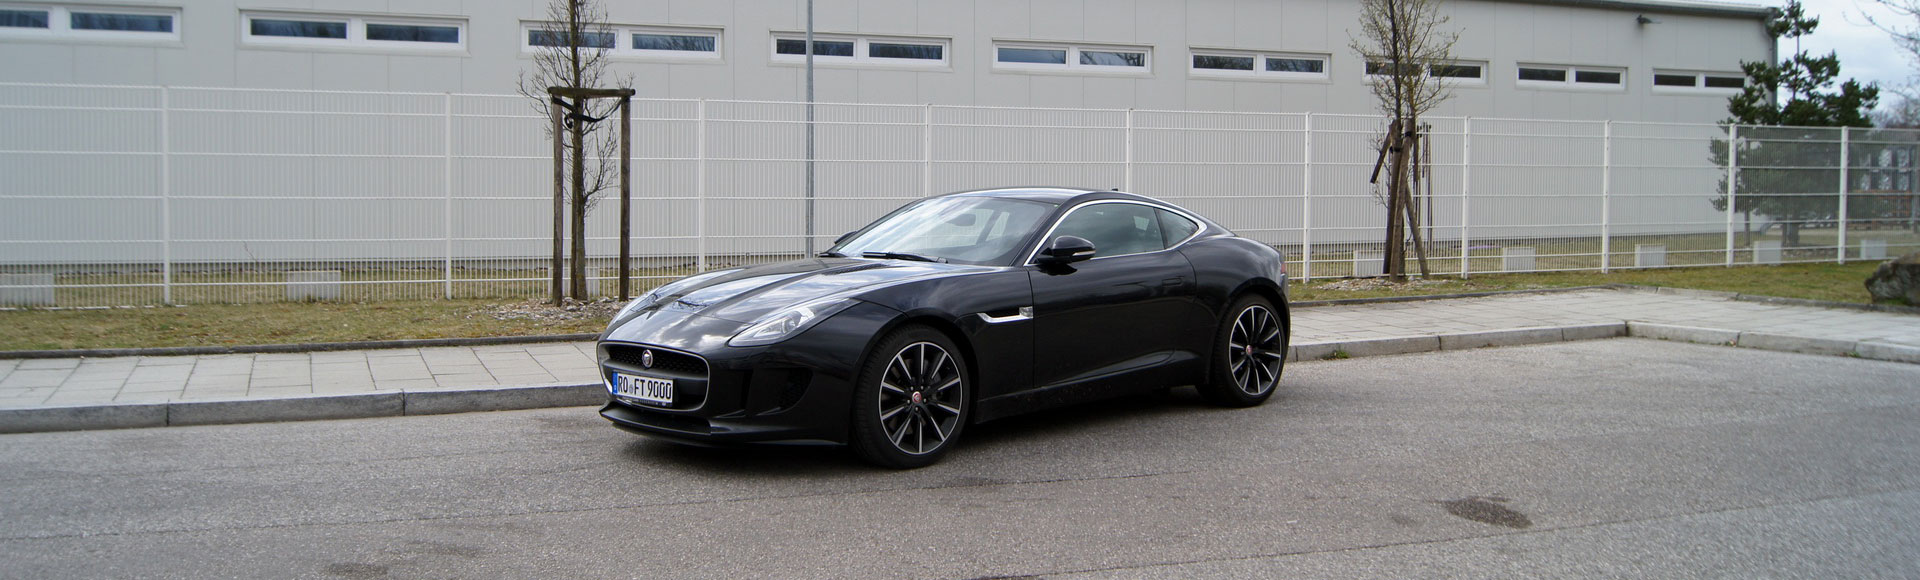 Jaguar F Type 2015 Spring 9531